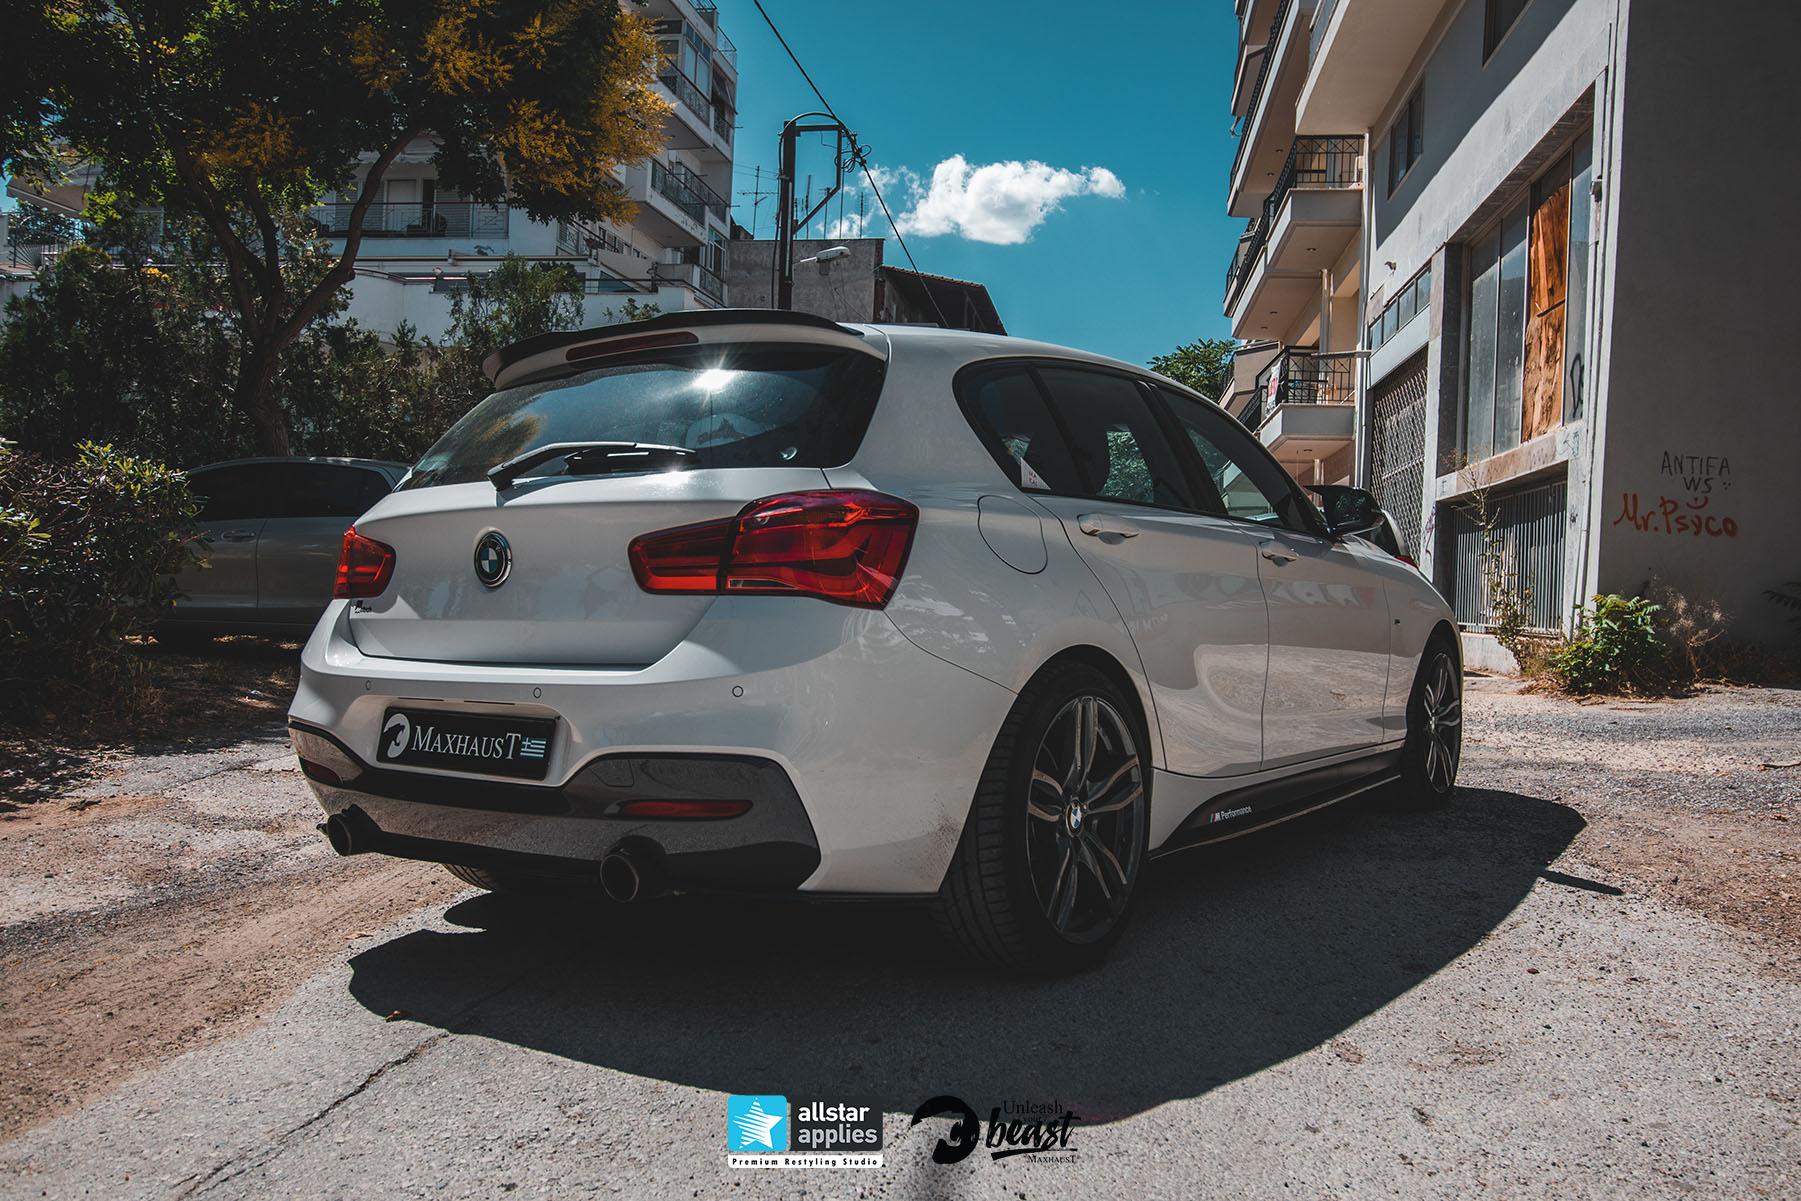 BMW SERIES 1 M PACKET MAXHAUST 8